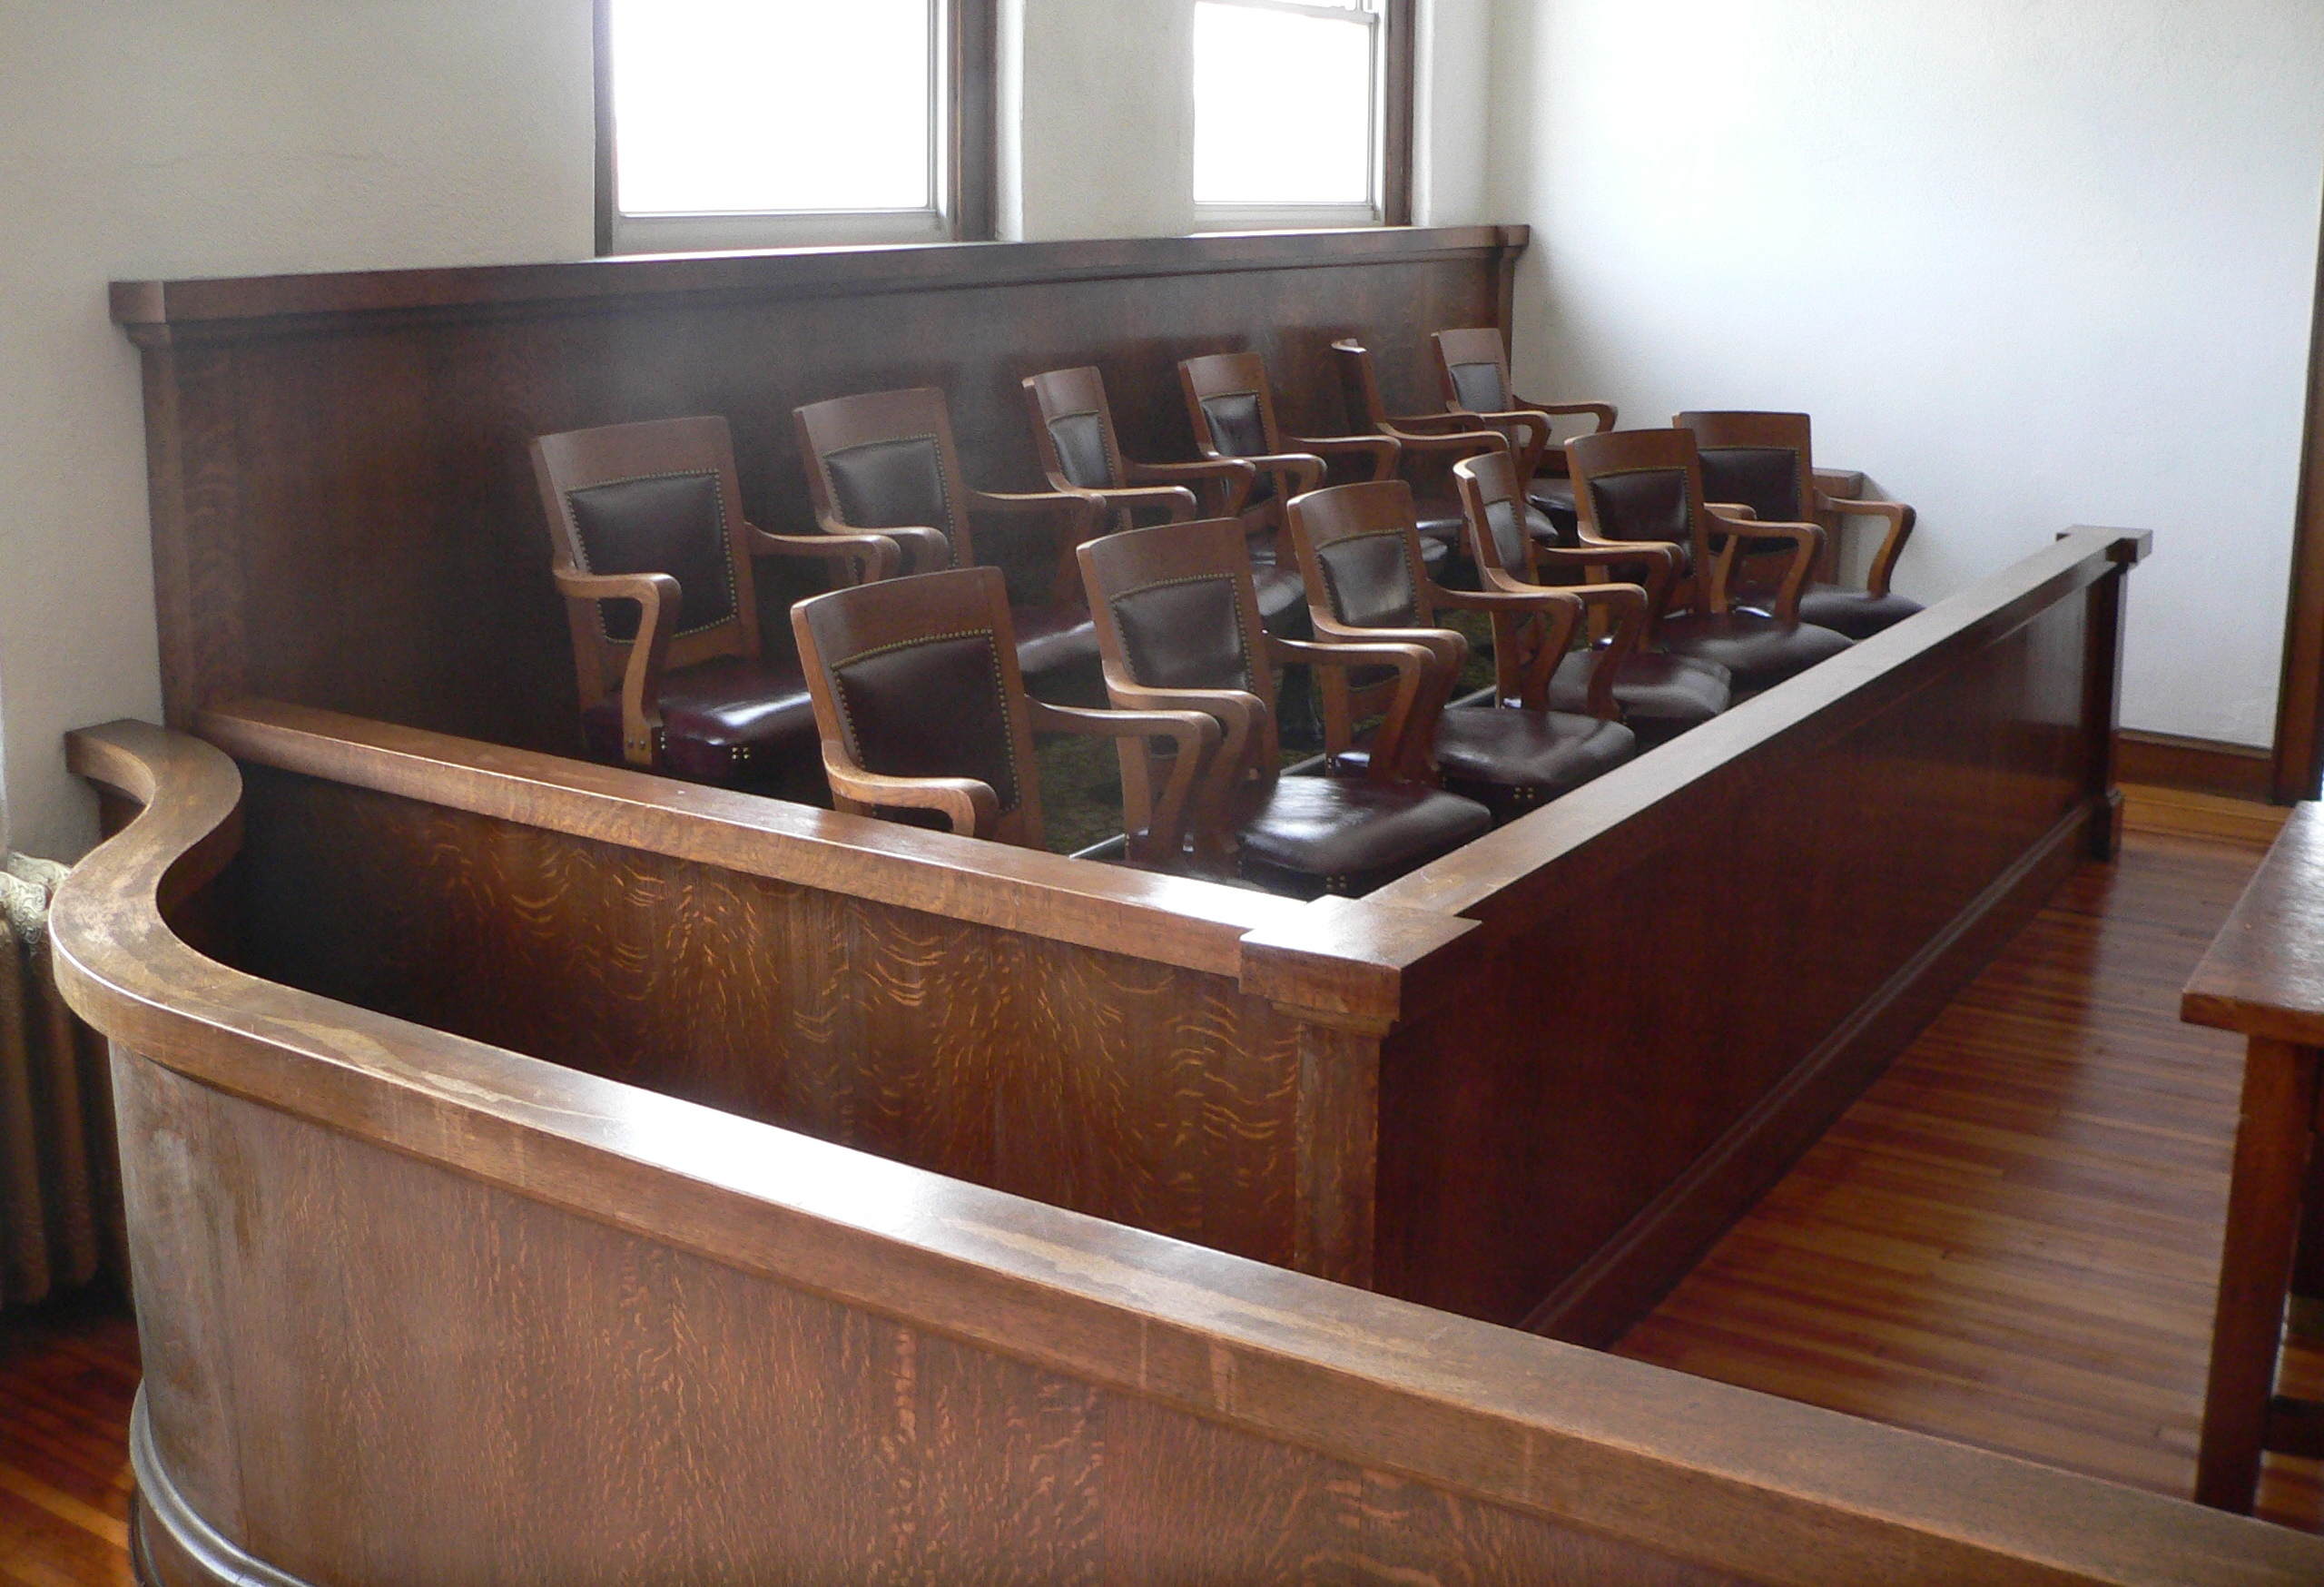 Webster_County,_Nebraska_courthouse_courtroom_3